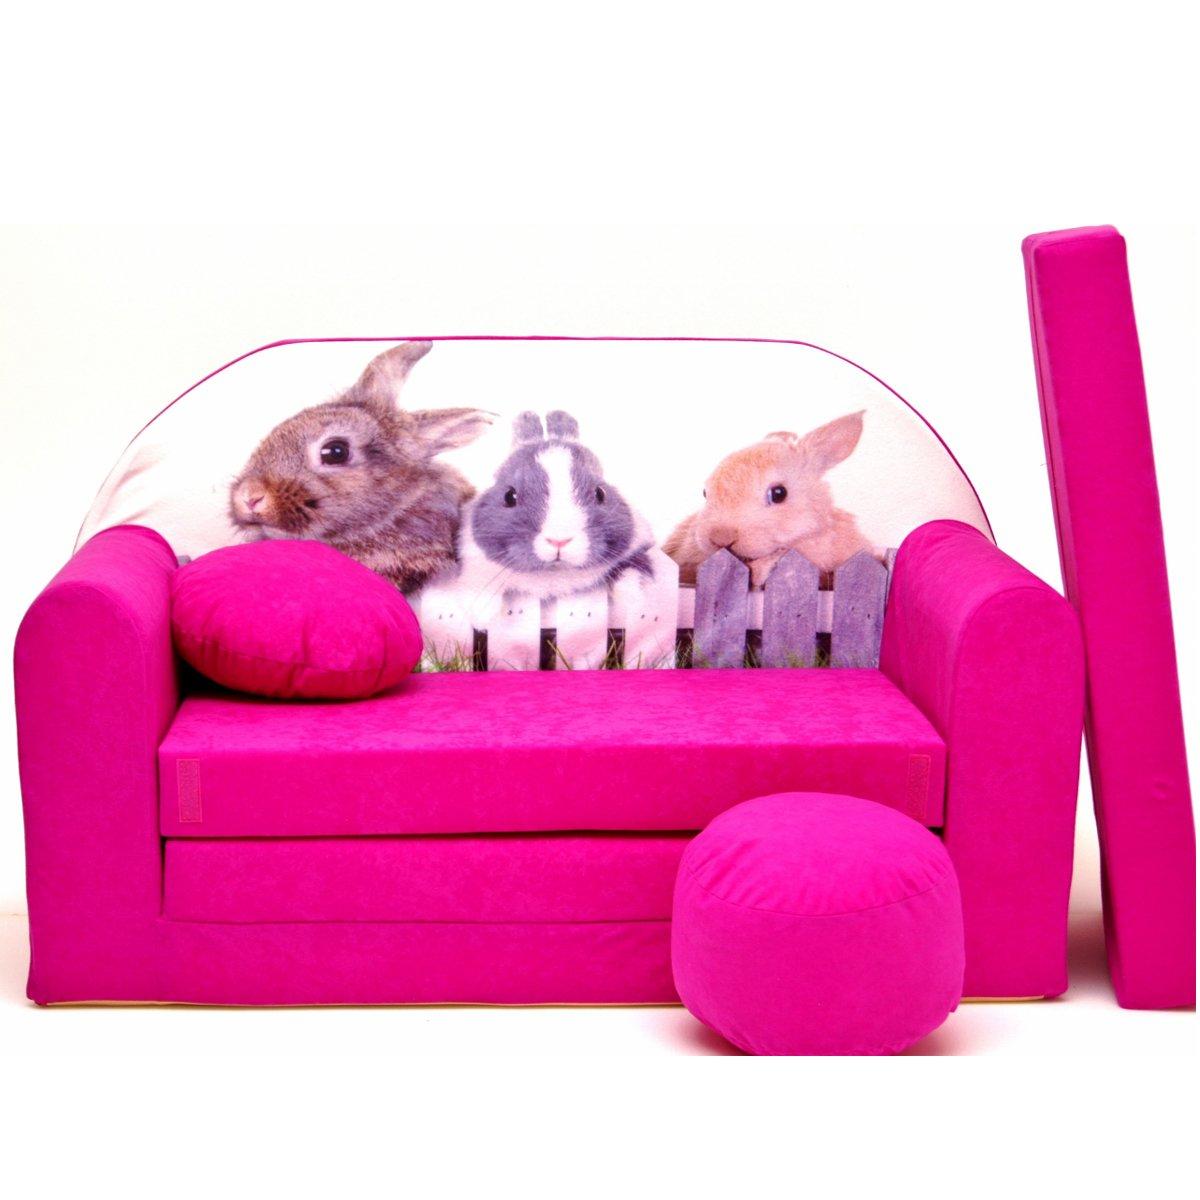 H25 de S Niños Bar Dormir emergente sofá sofá sofá Mini sofá 3 en 1 Baby Set + – Sillón infantil y asiento cojín + colchón